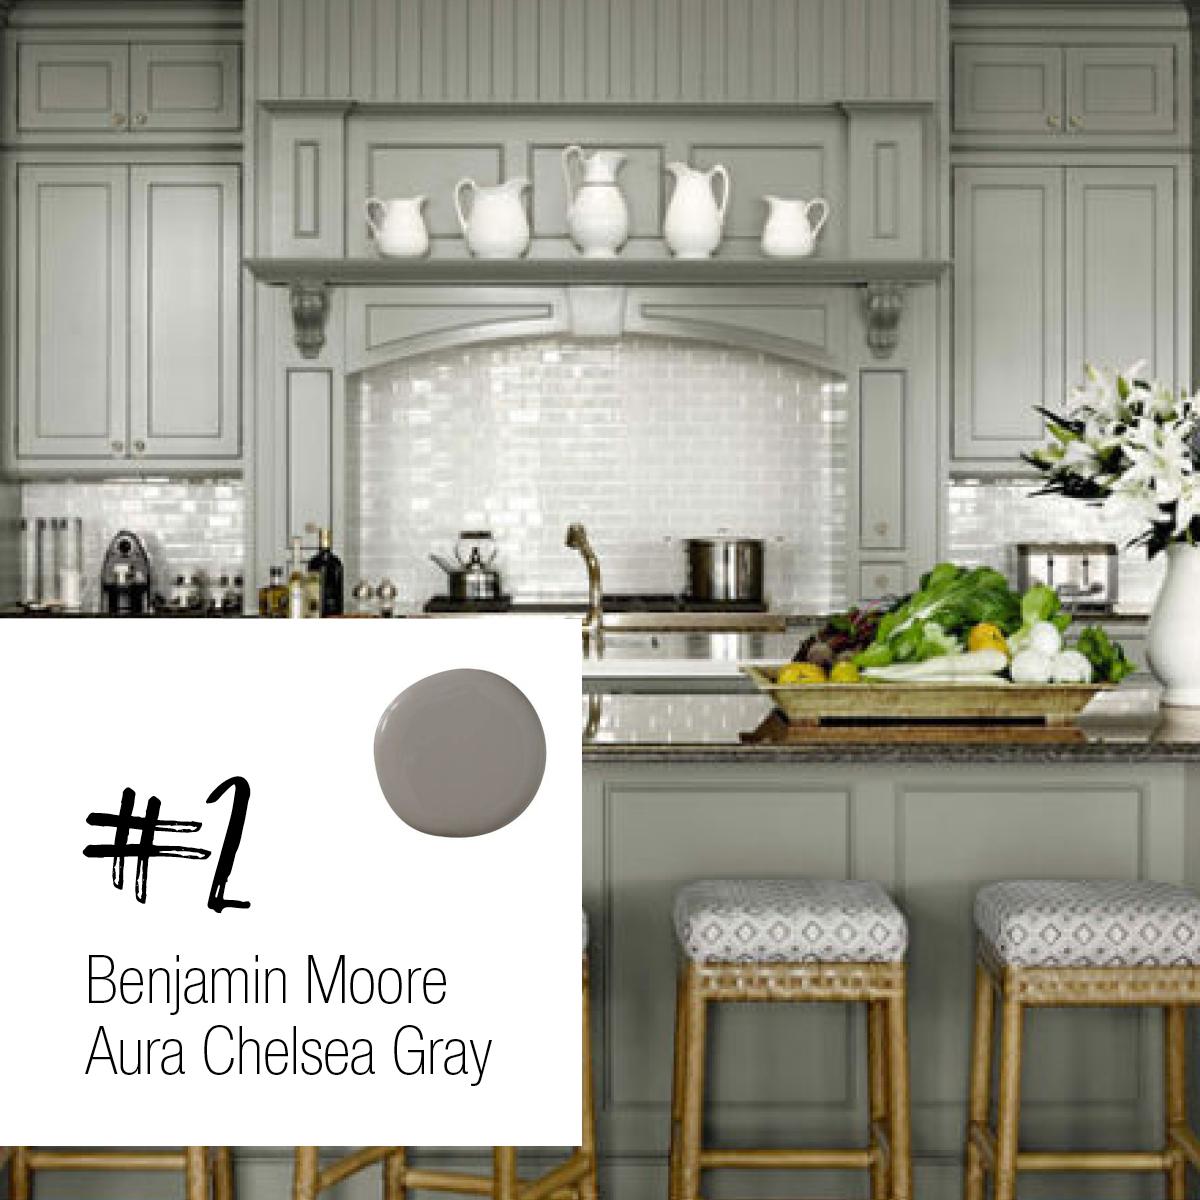 Benjamin Moore Aura Chelsea Gray